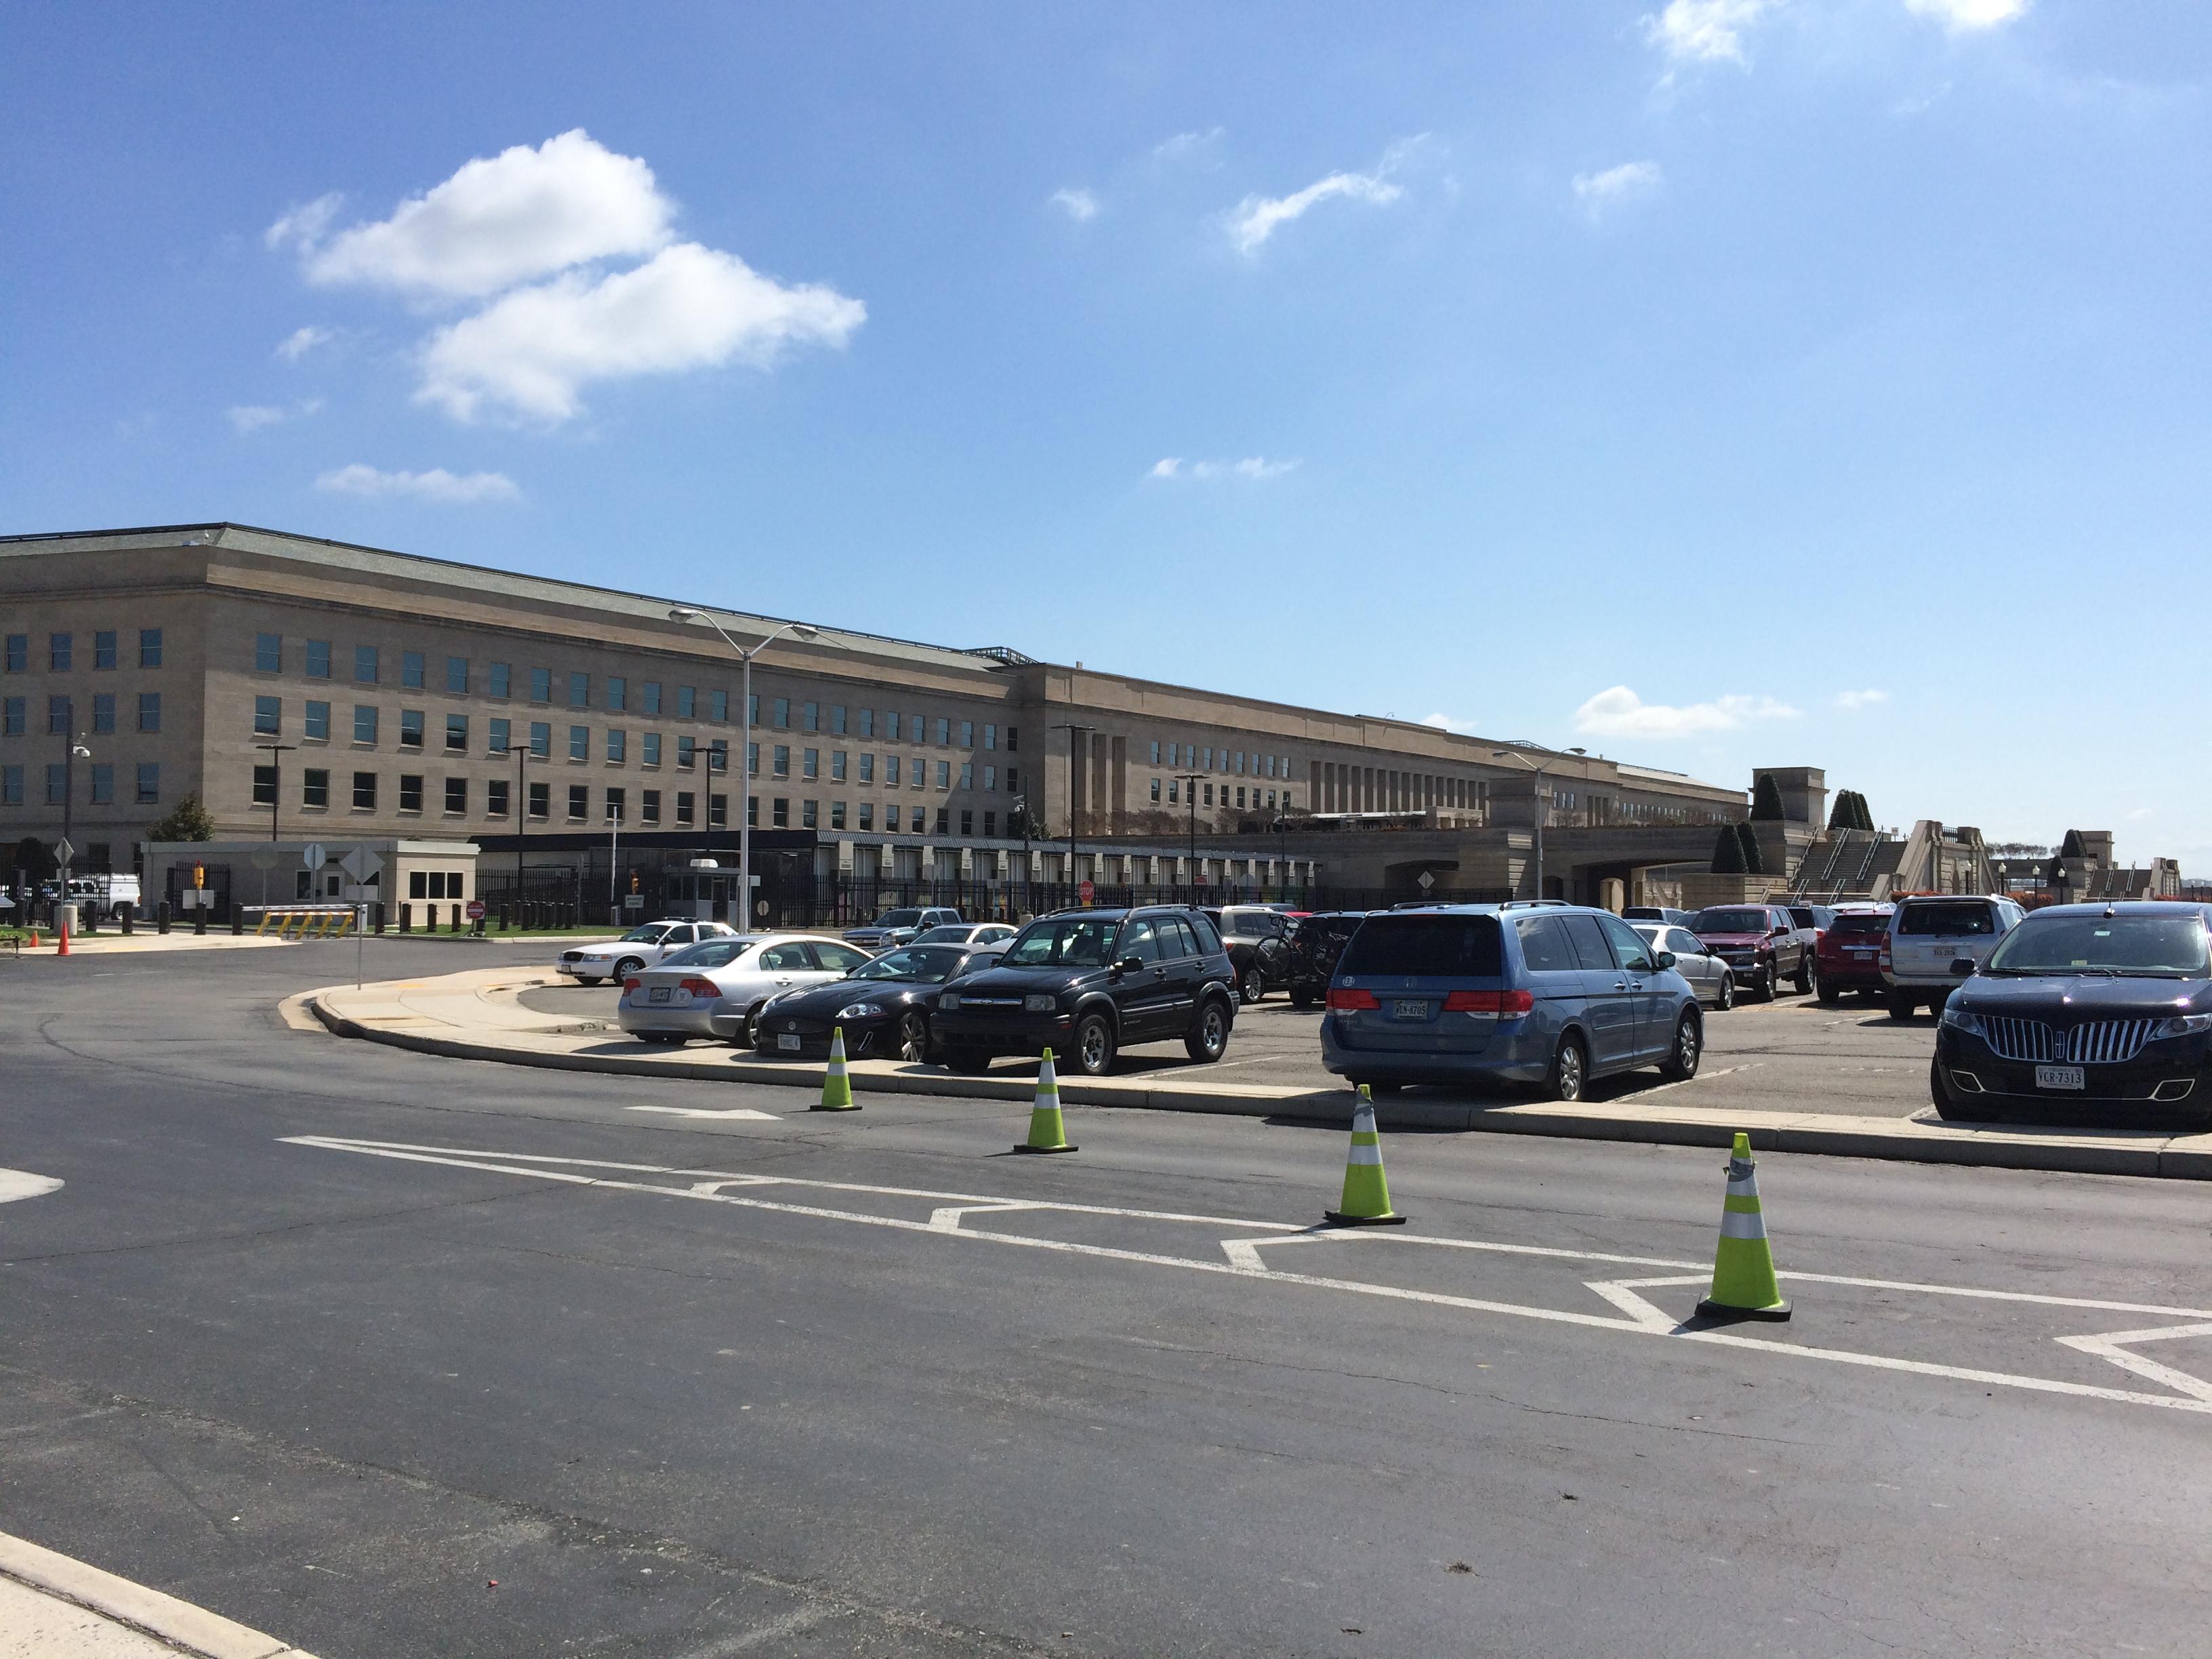 Can You Tour The Pentagon